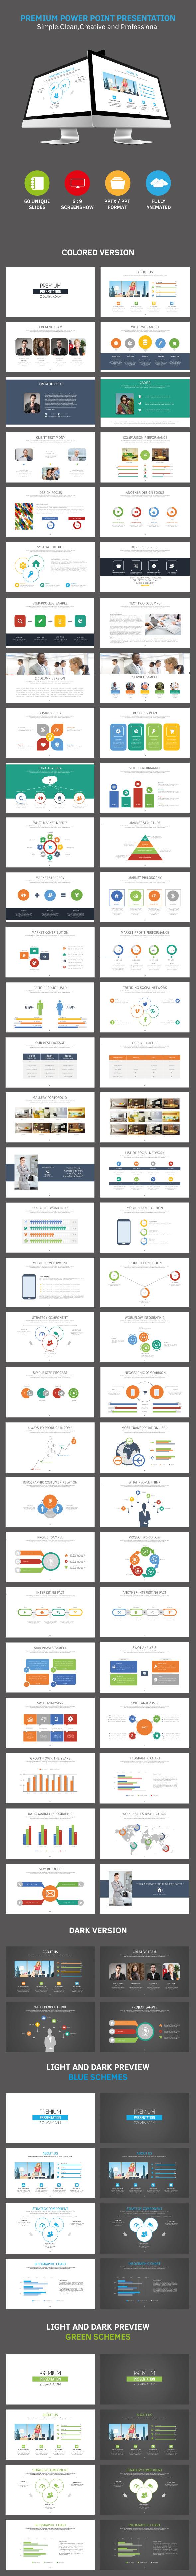 Premium Presentation Template - Miscellaneous PowerPoint Templates